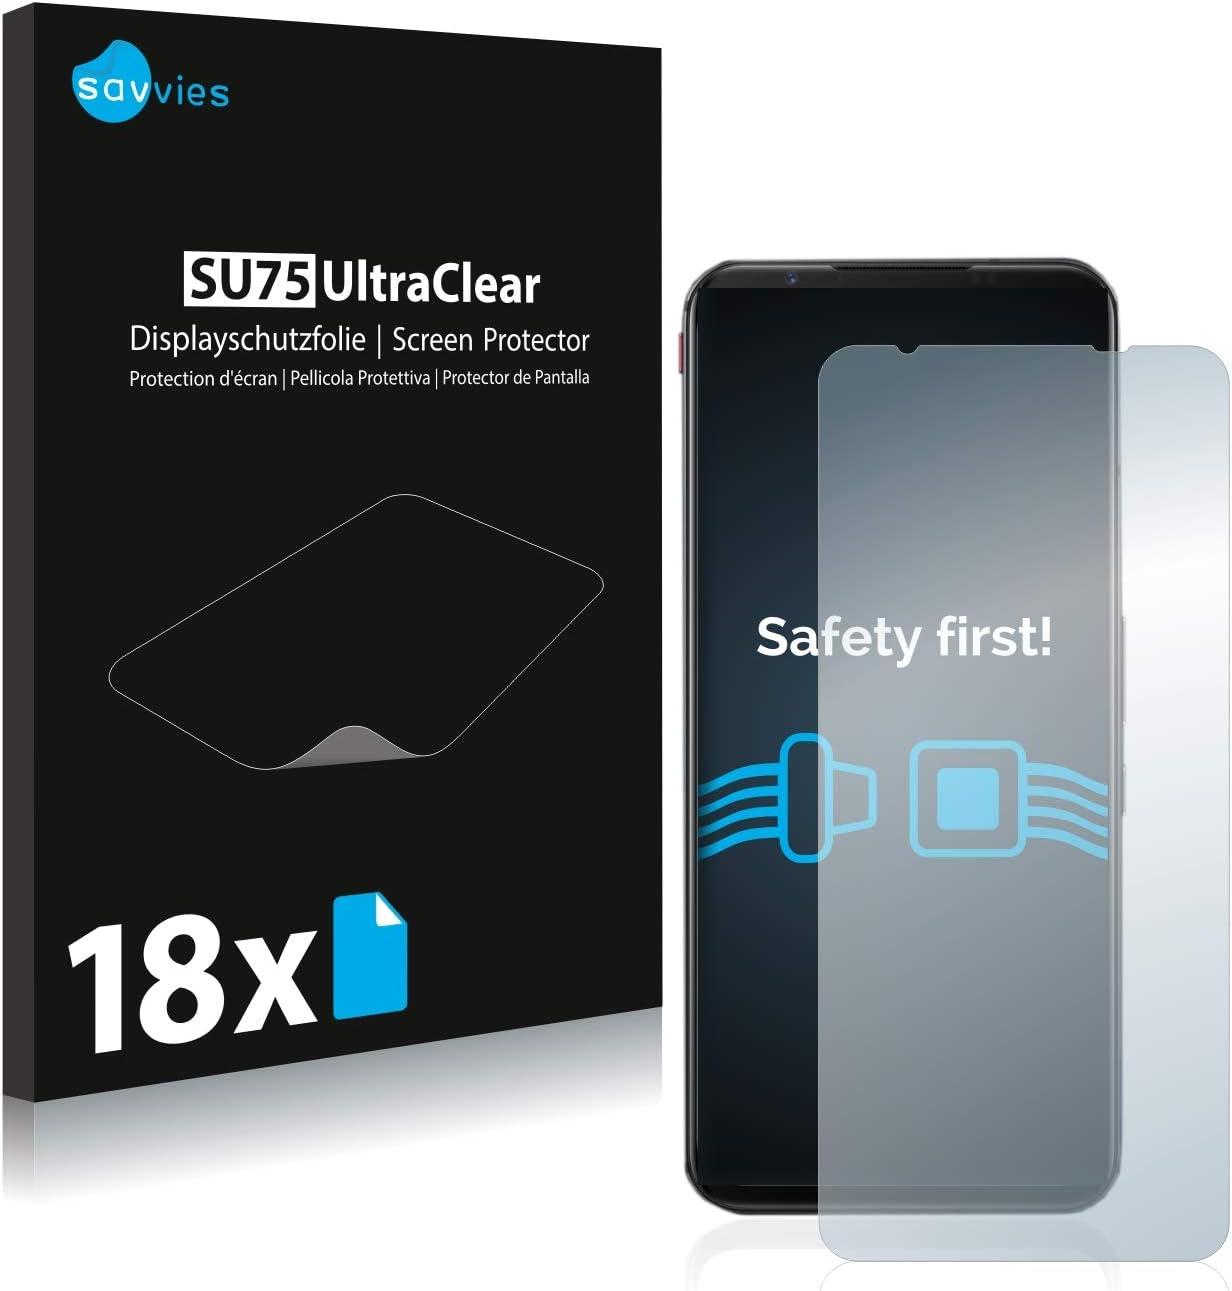 18x Savvies SU75 Screen Protector for